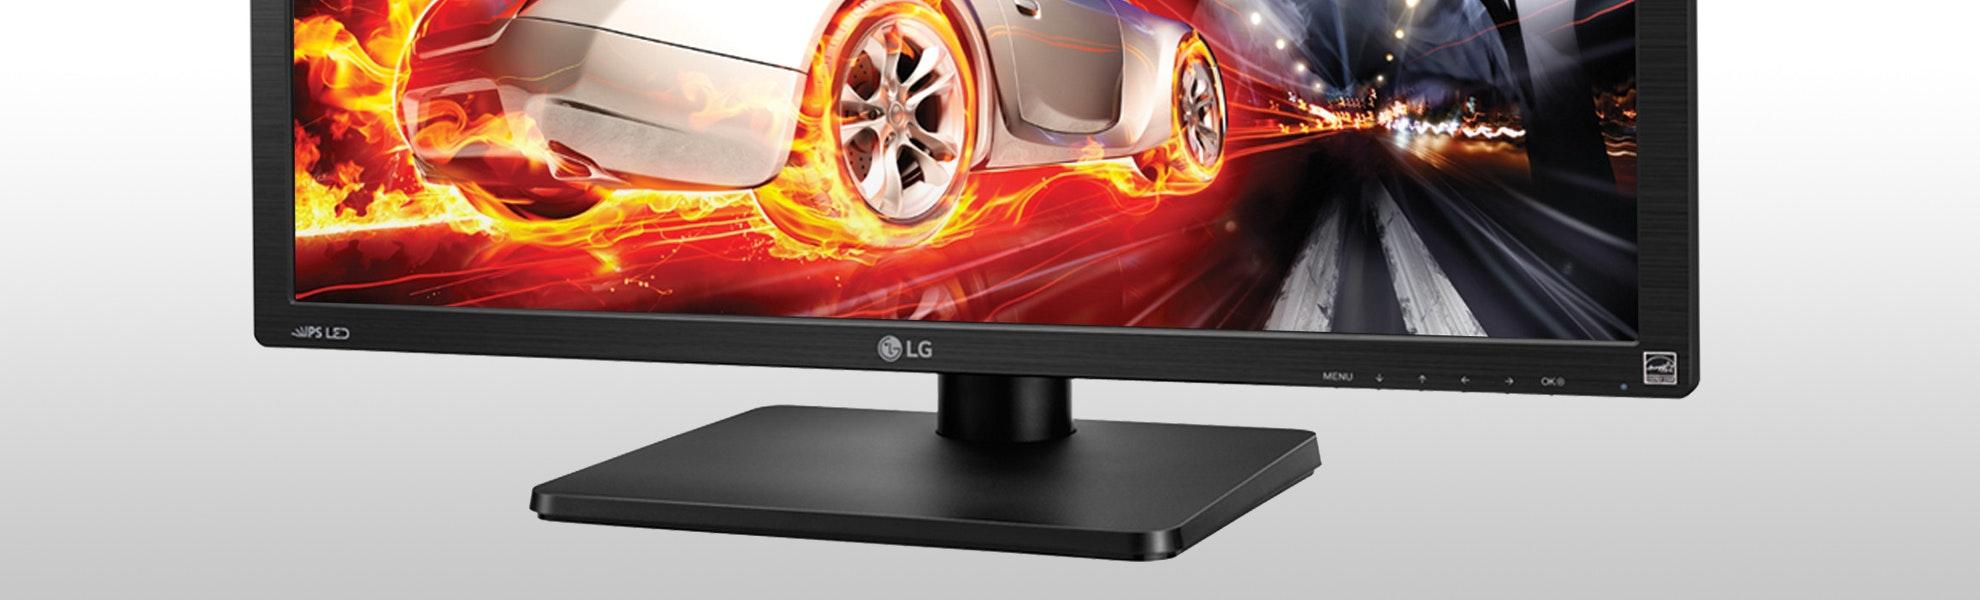 "LG 27"" Ultra HD 4K Monitor"